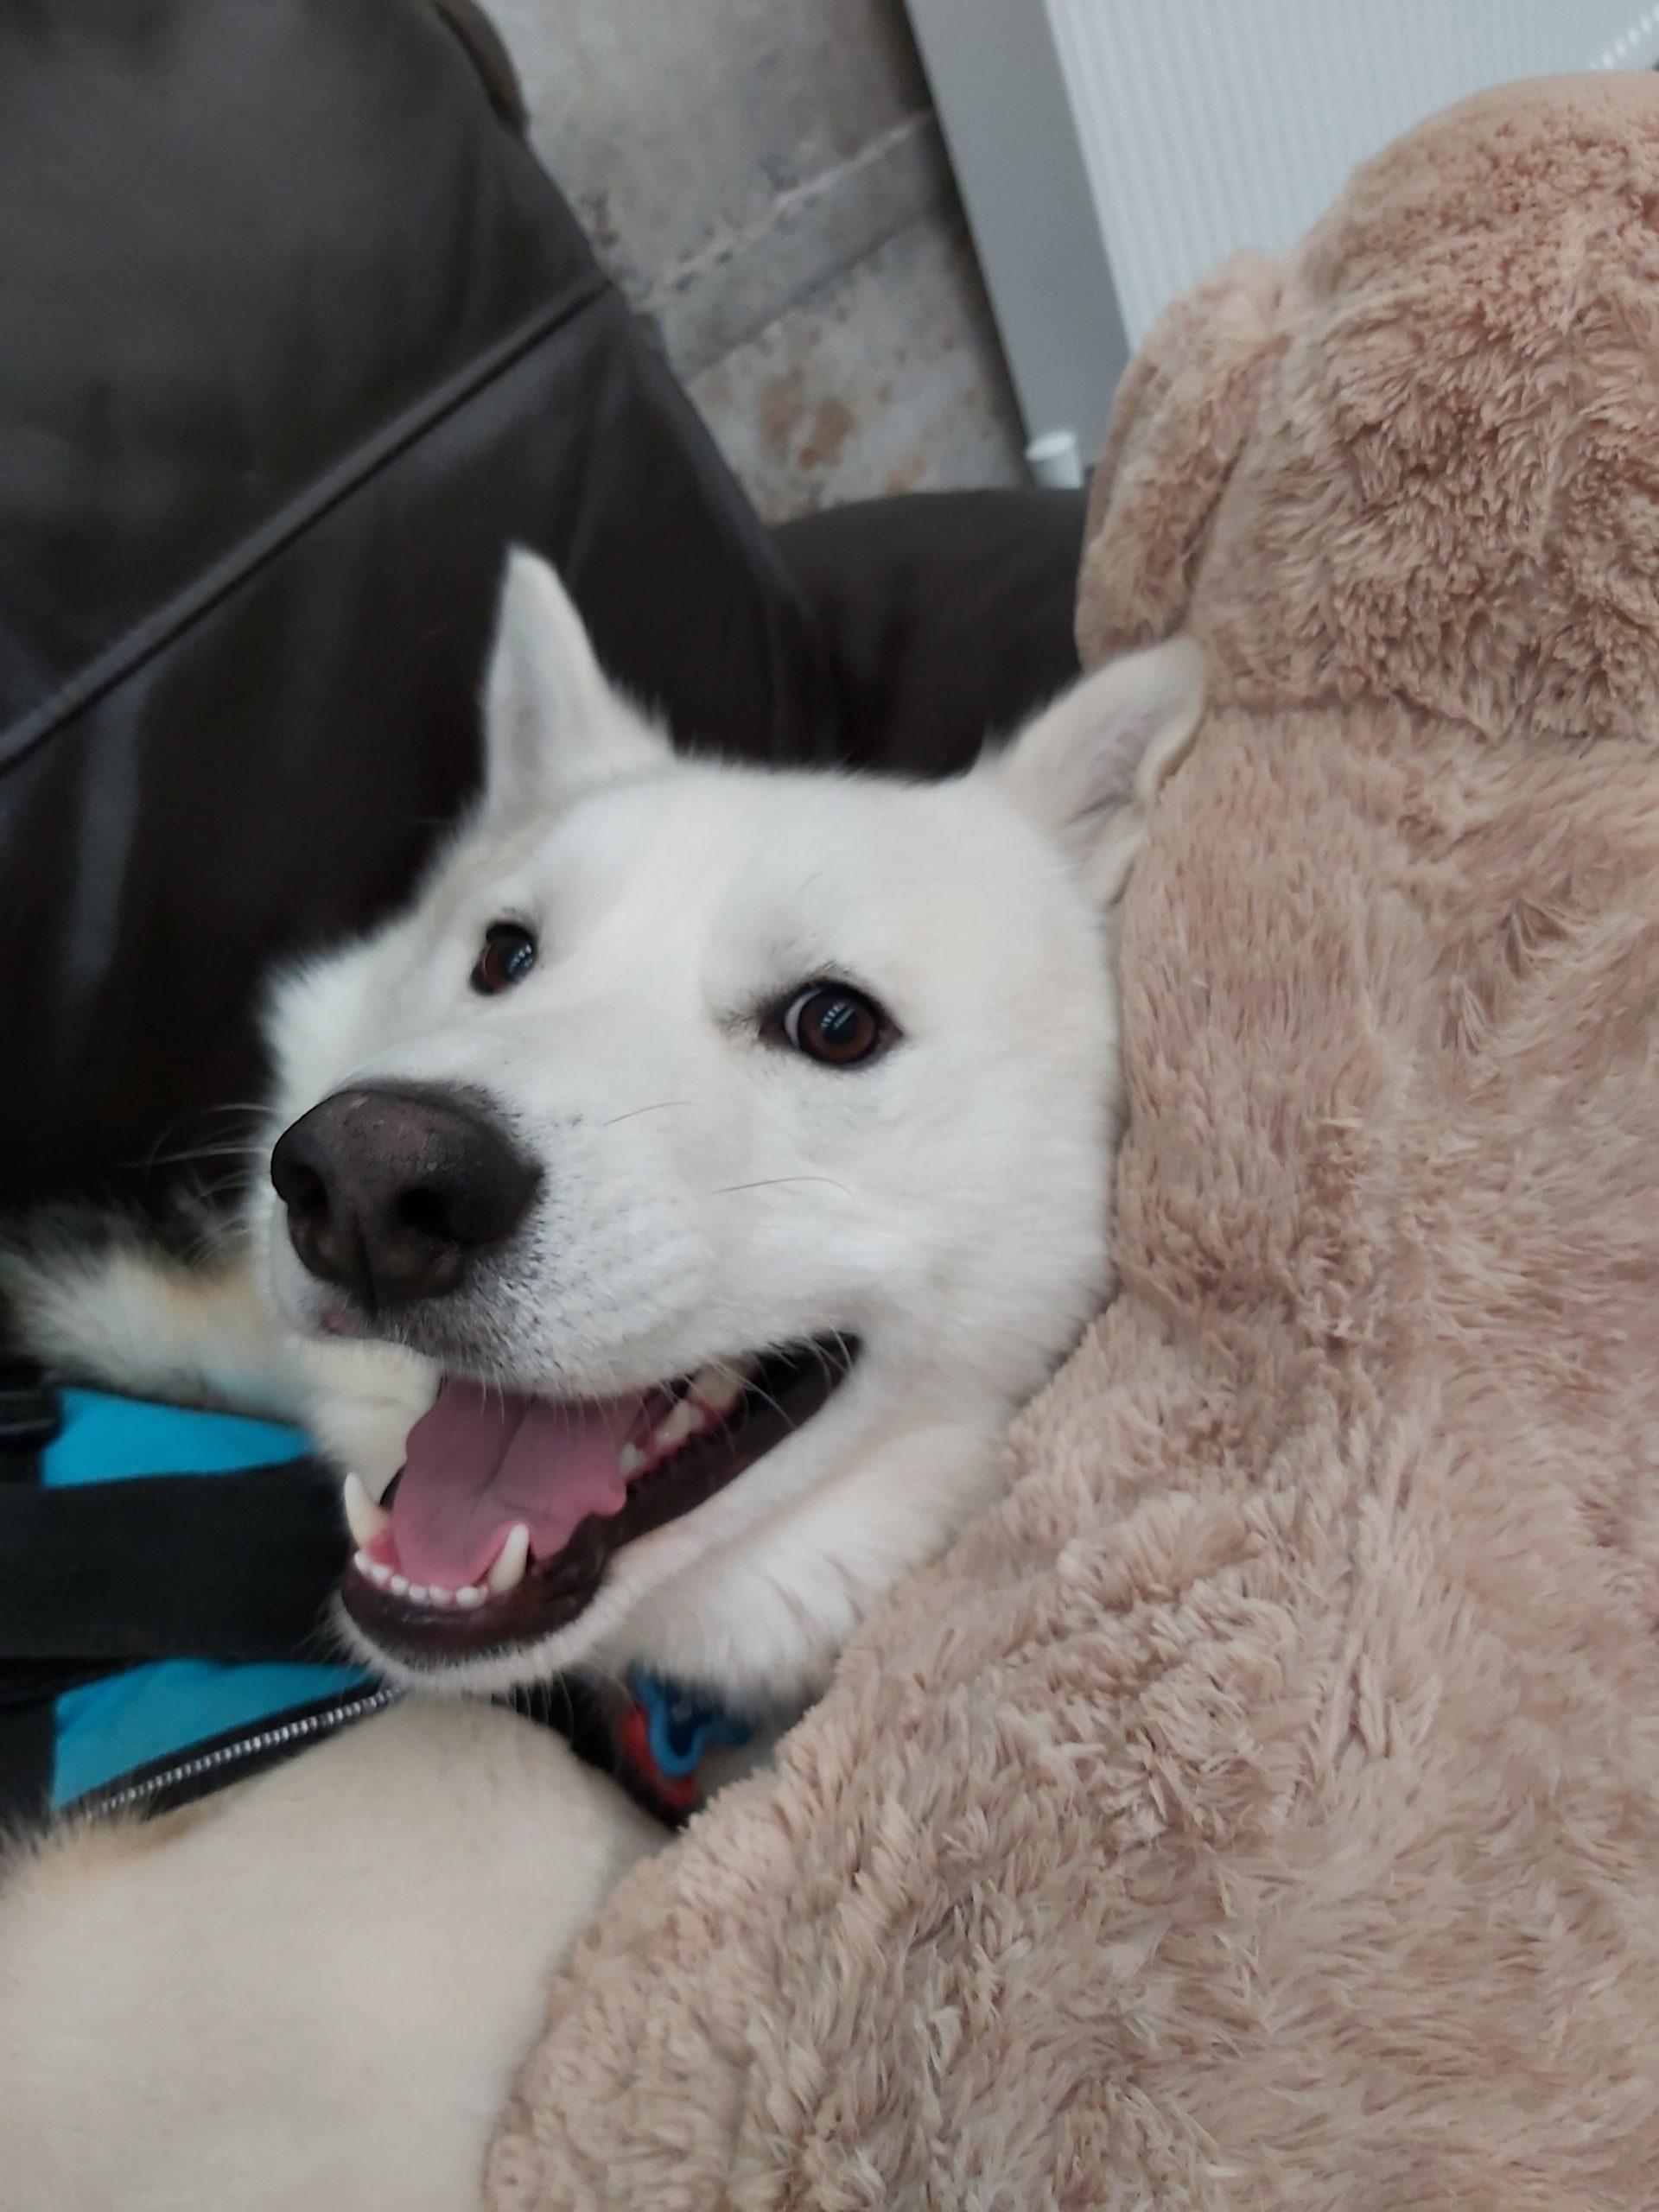 Fluffy Paws Doggie Daycare Ltd